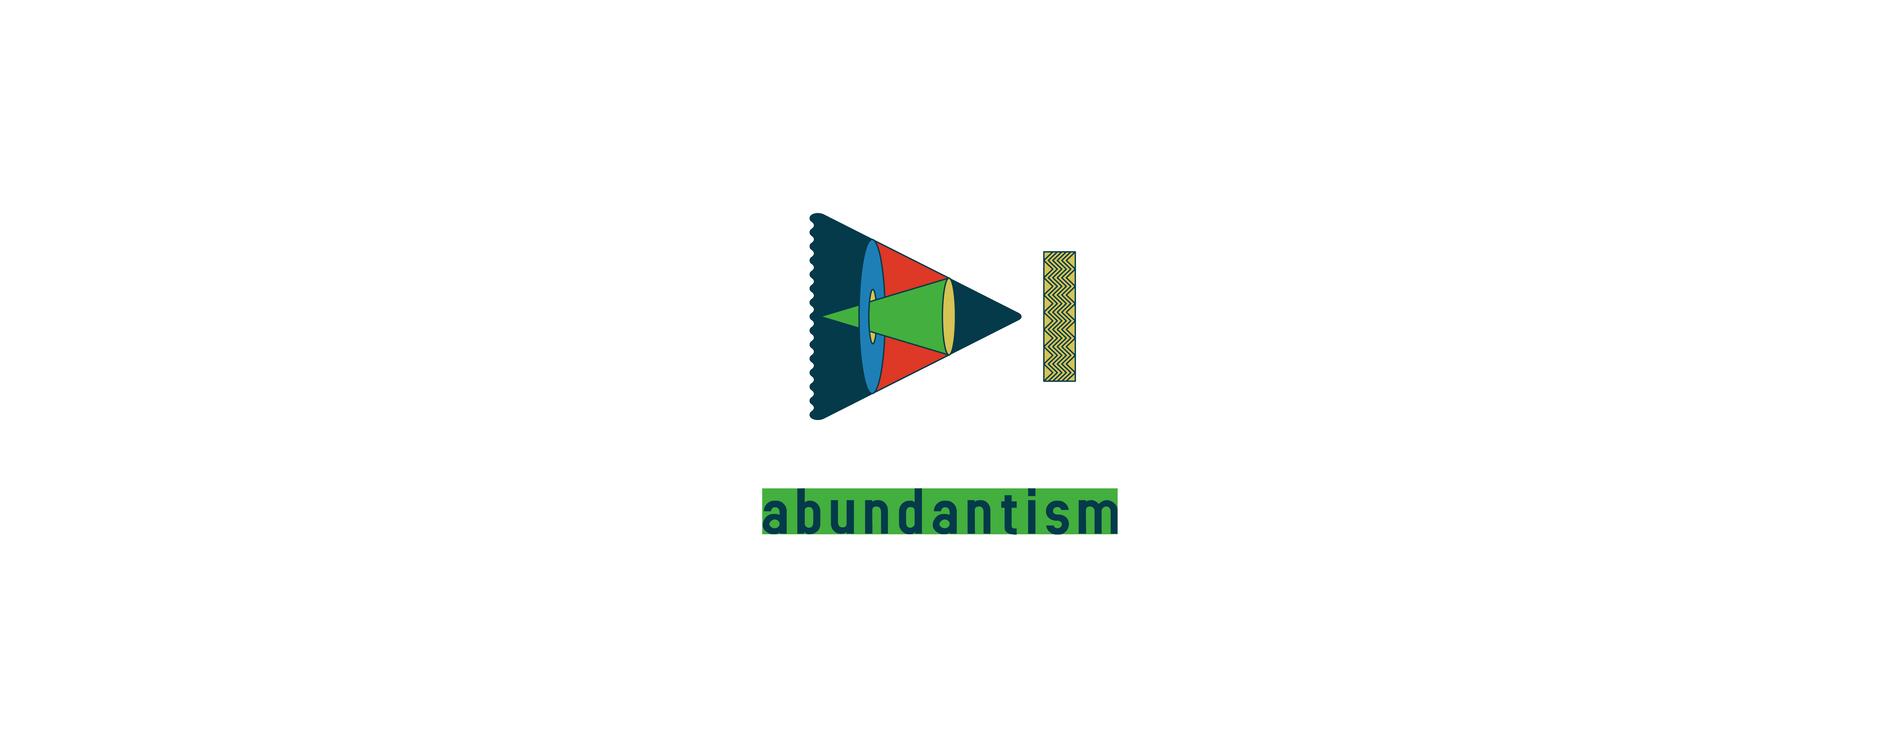 abundantism